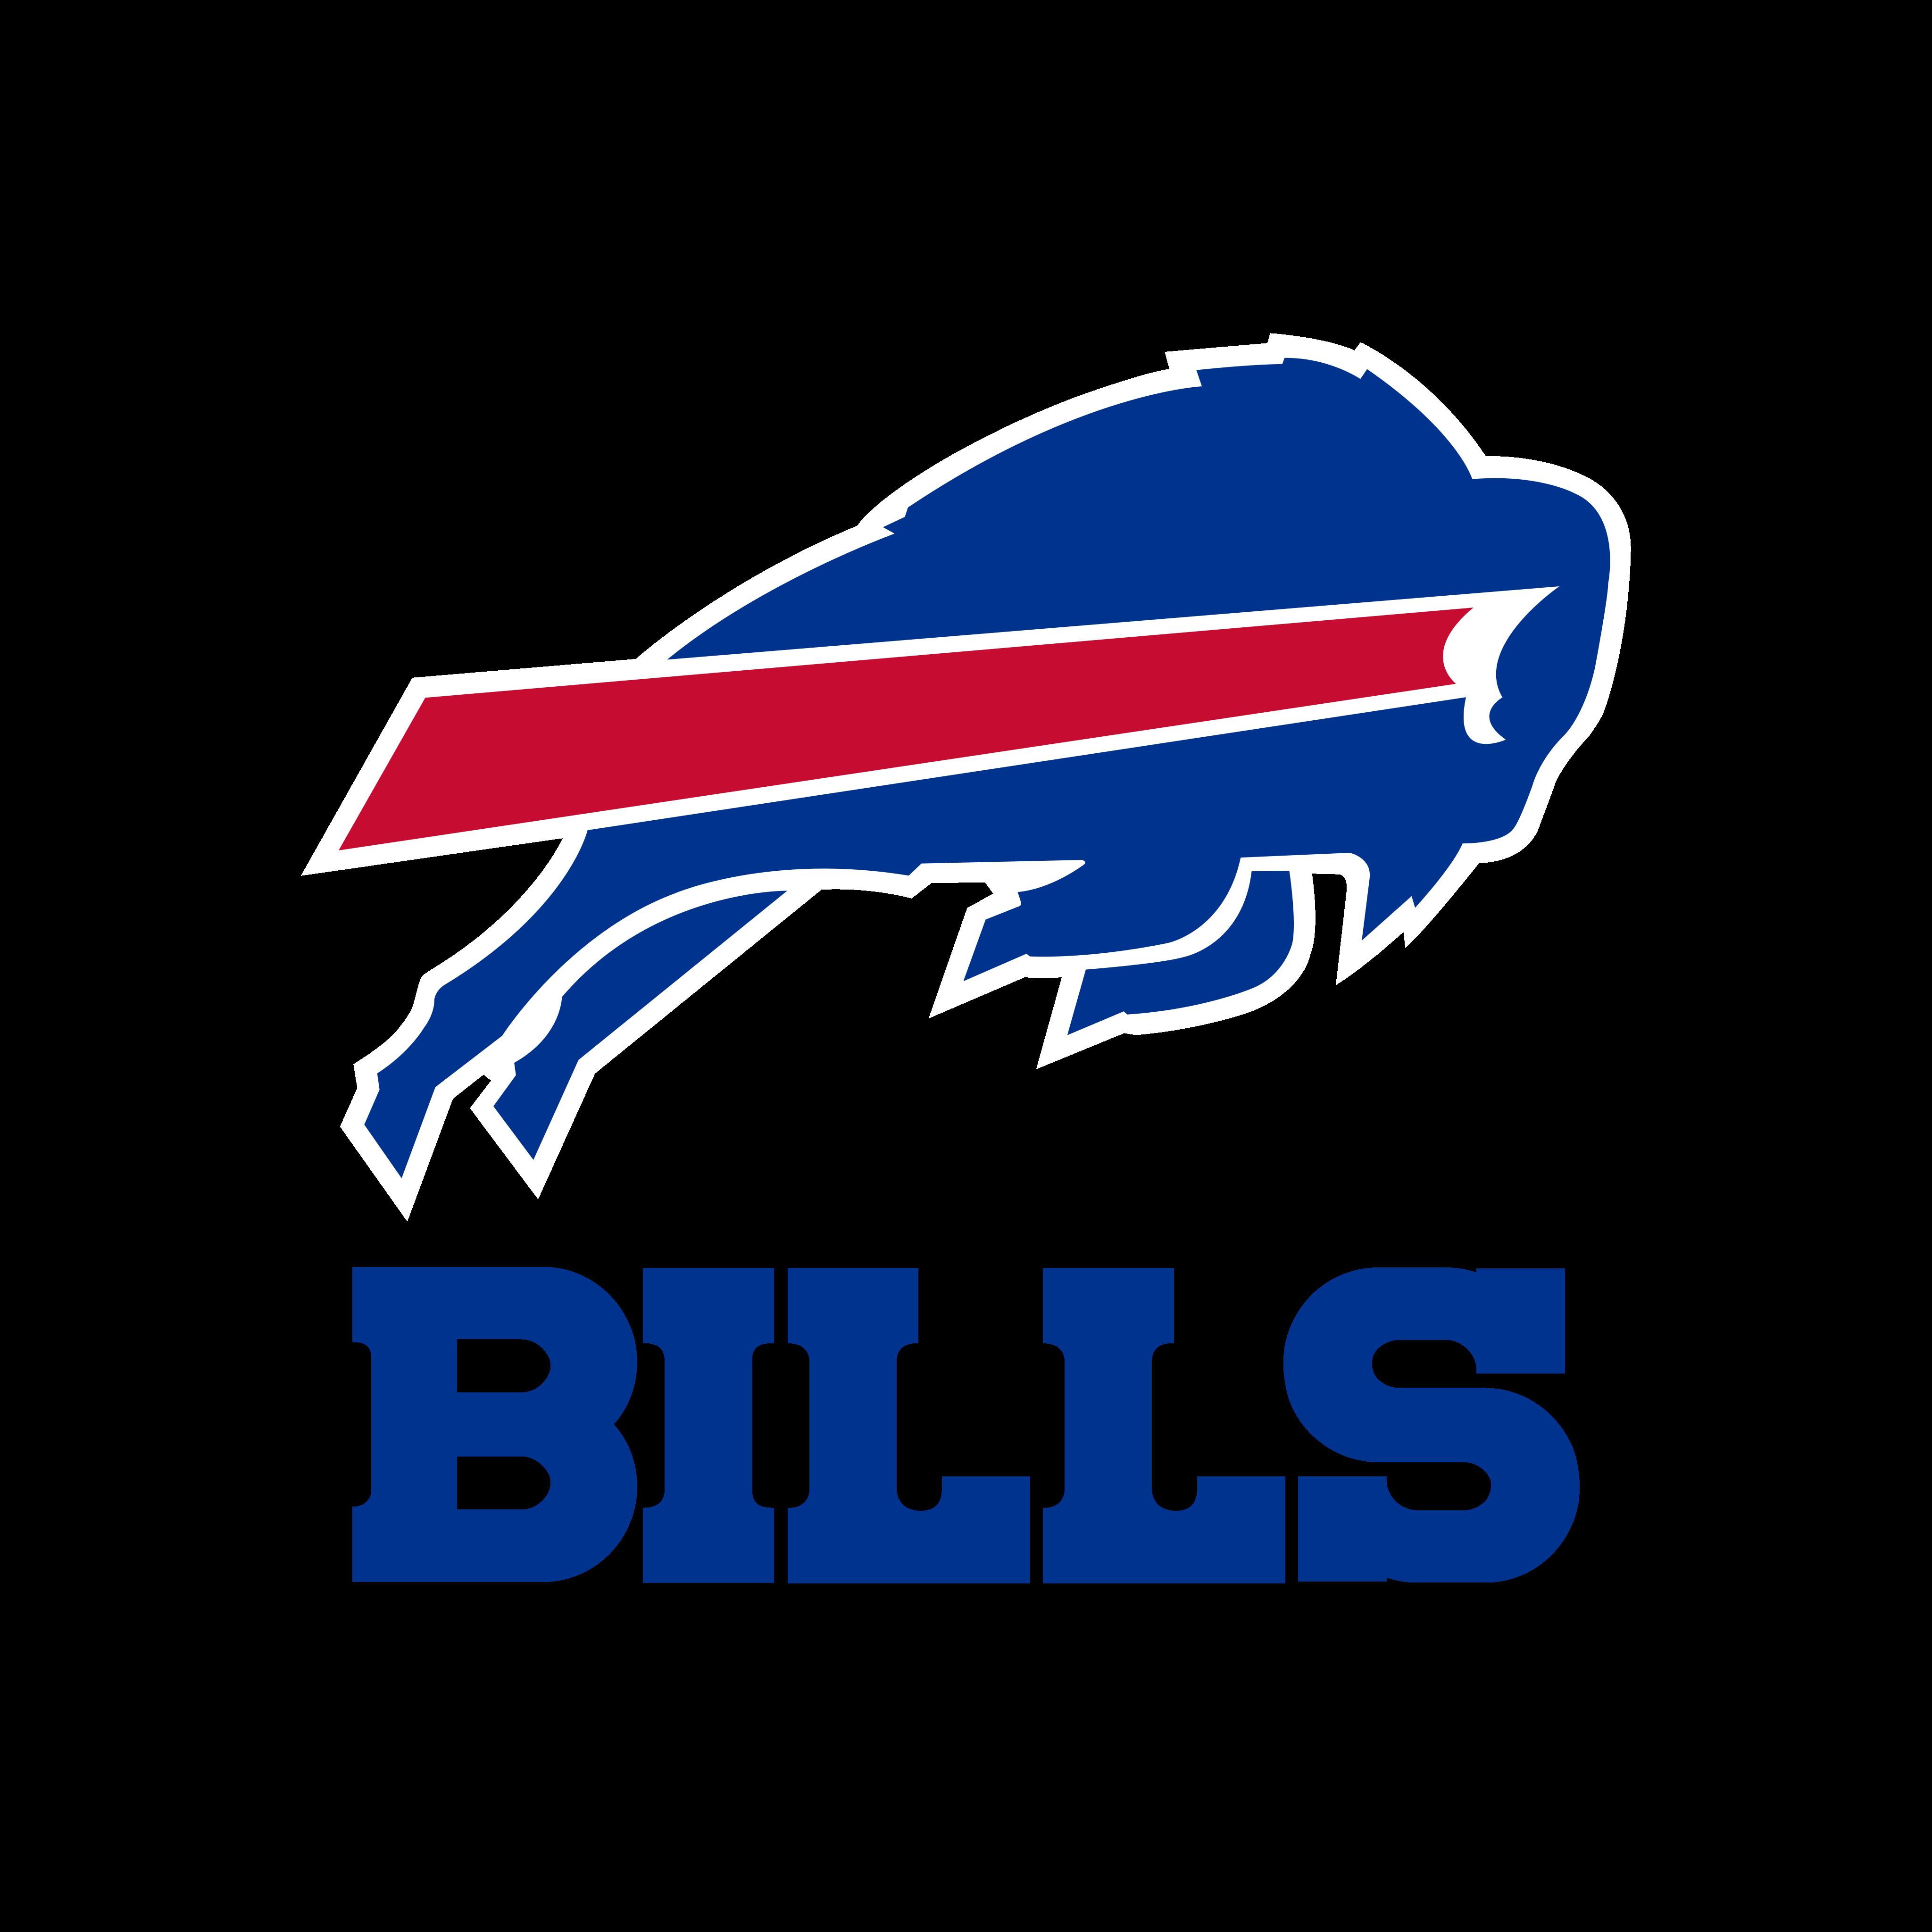 buffalo bills logo 0 - Buffalo Bills Logo